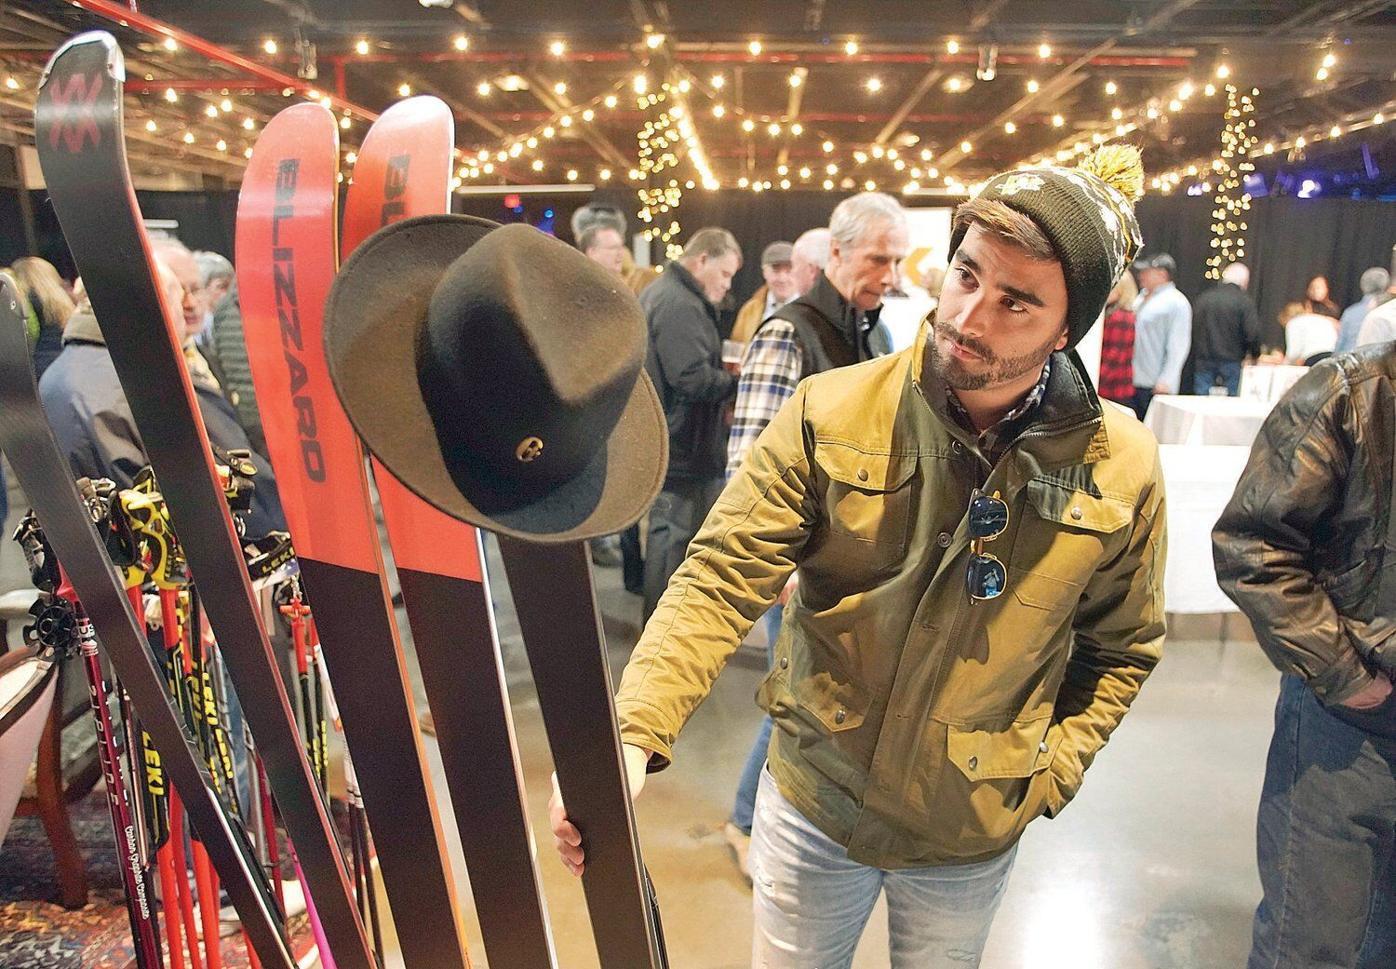 'Lost' ski areas generate conversation